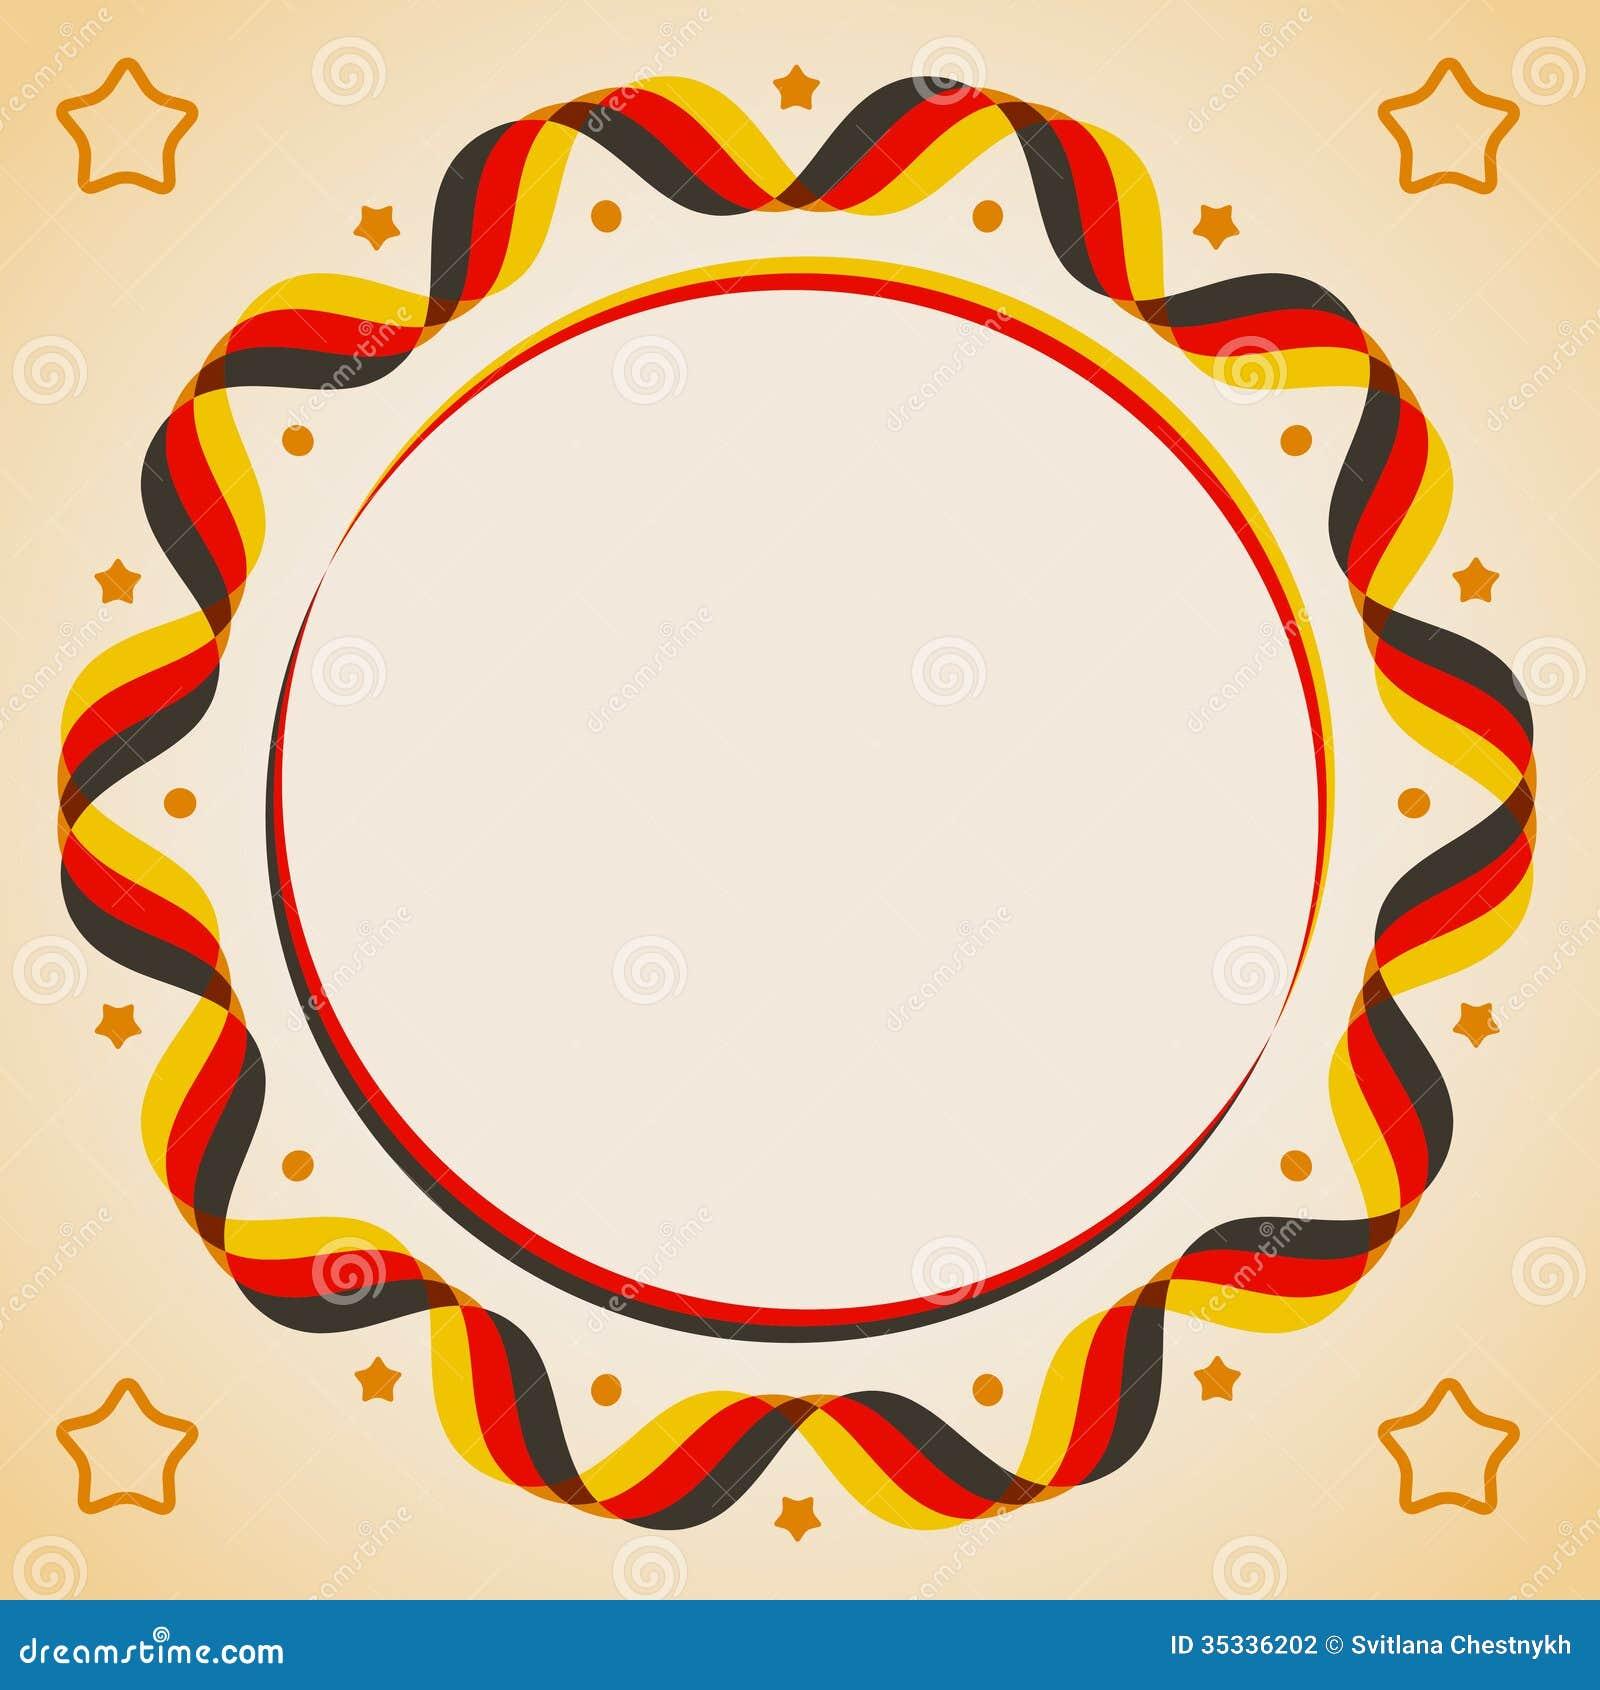 Design Elements Stock Photography Image 35336202